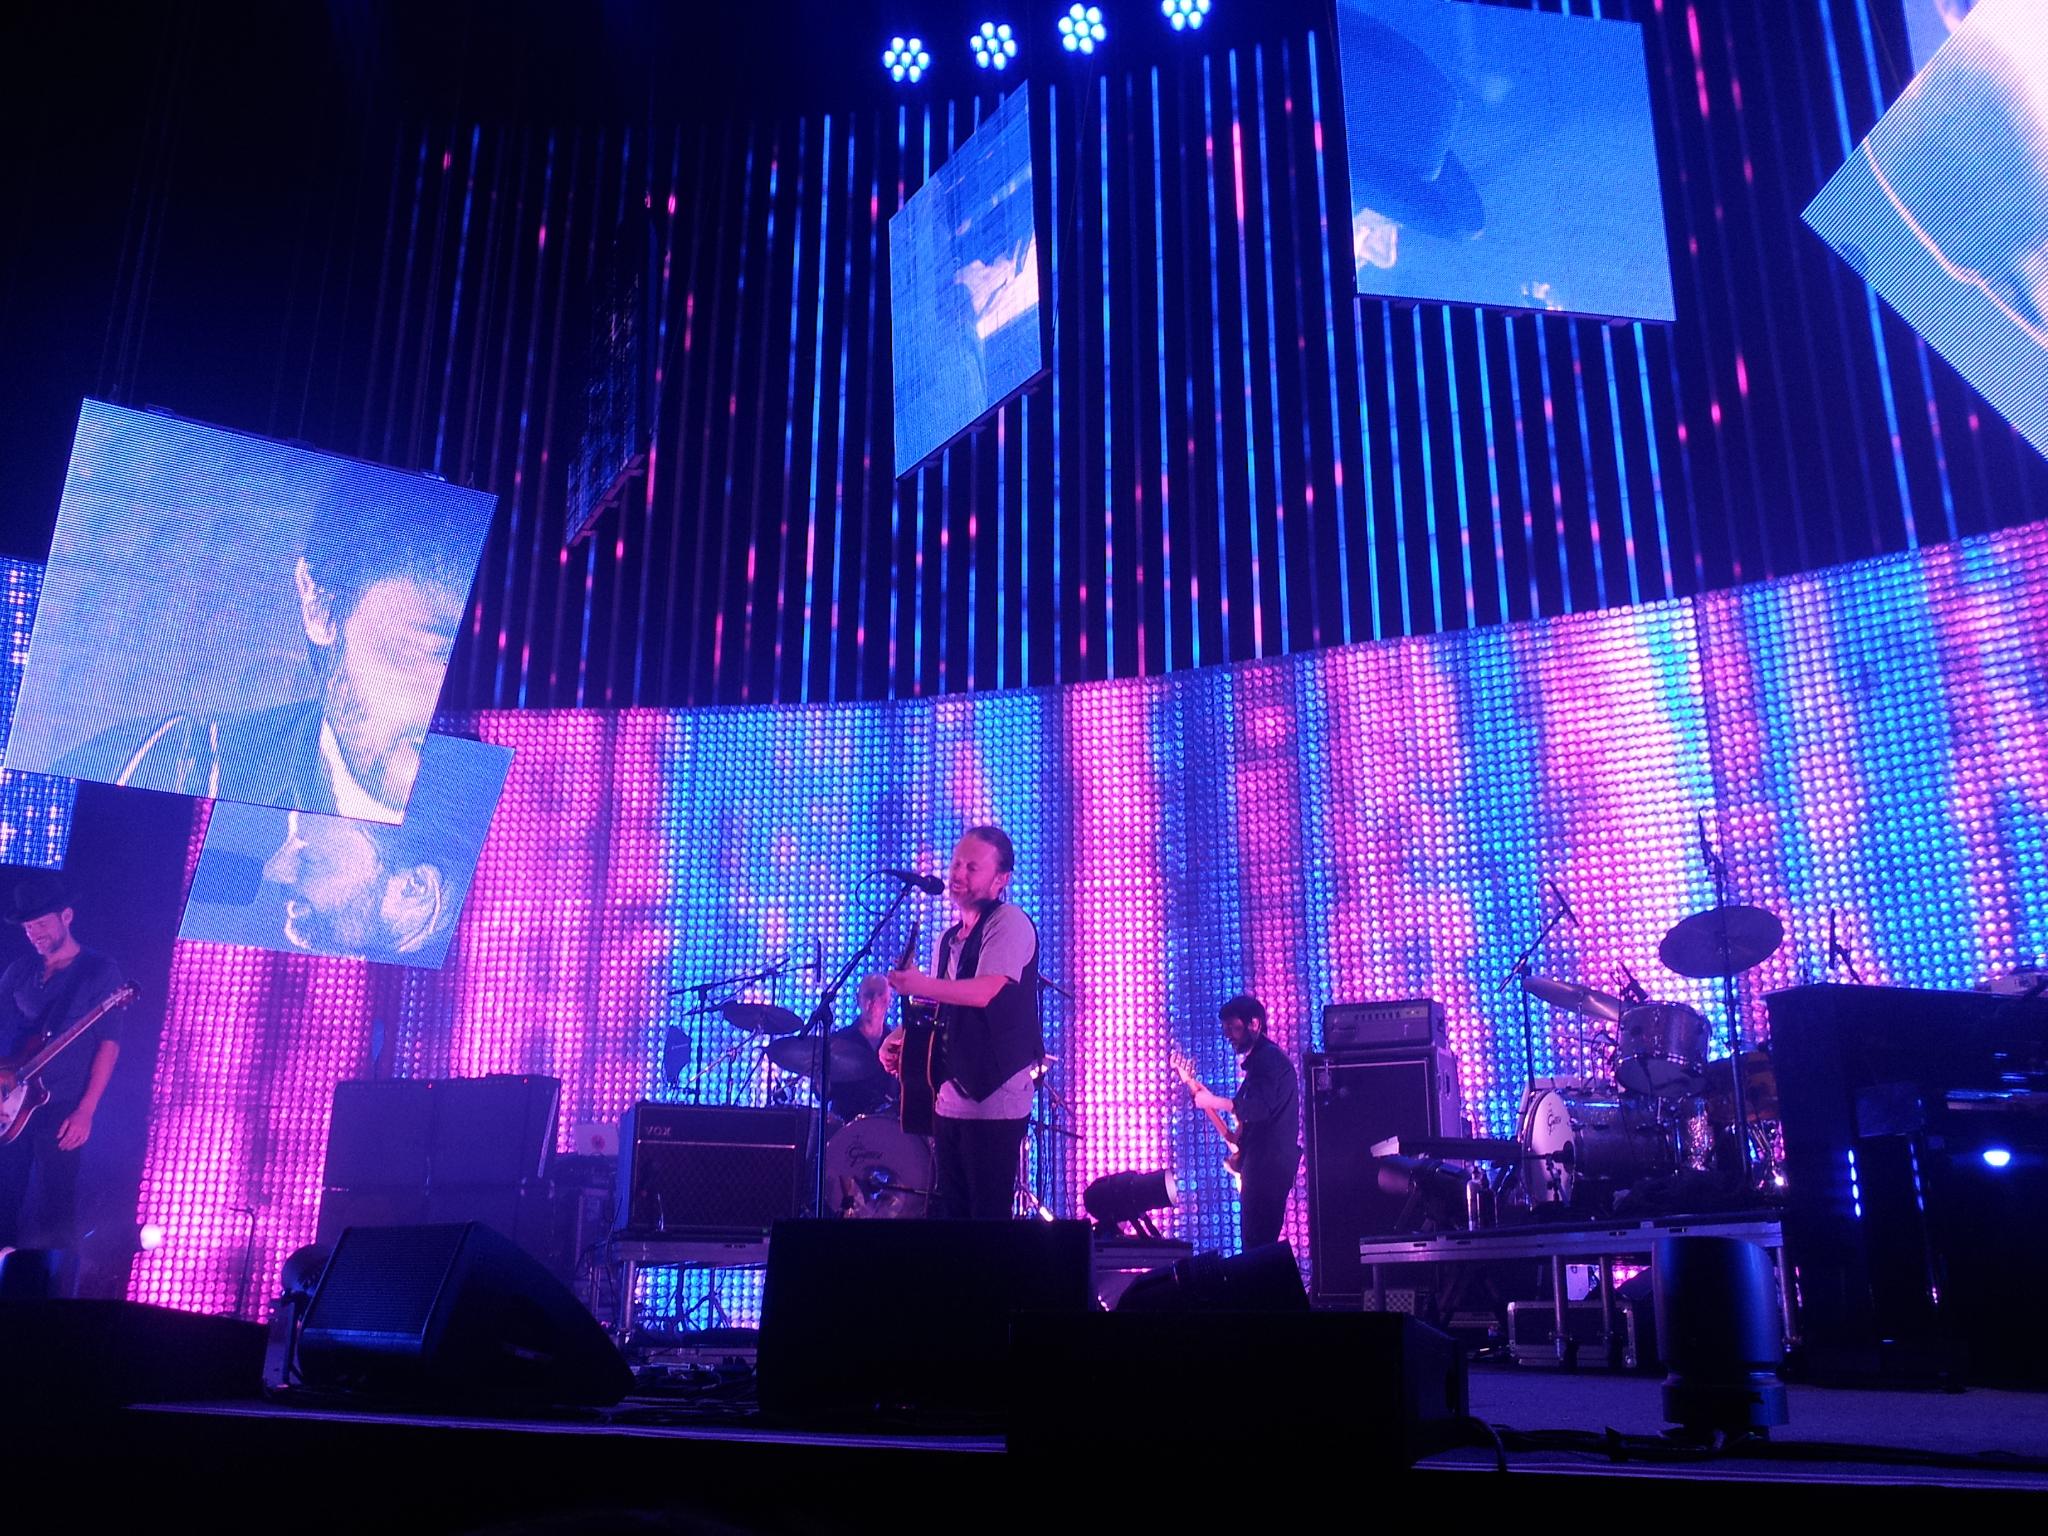 Radiohead, Live, Concert, Thom Yorke